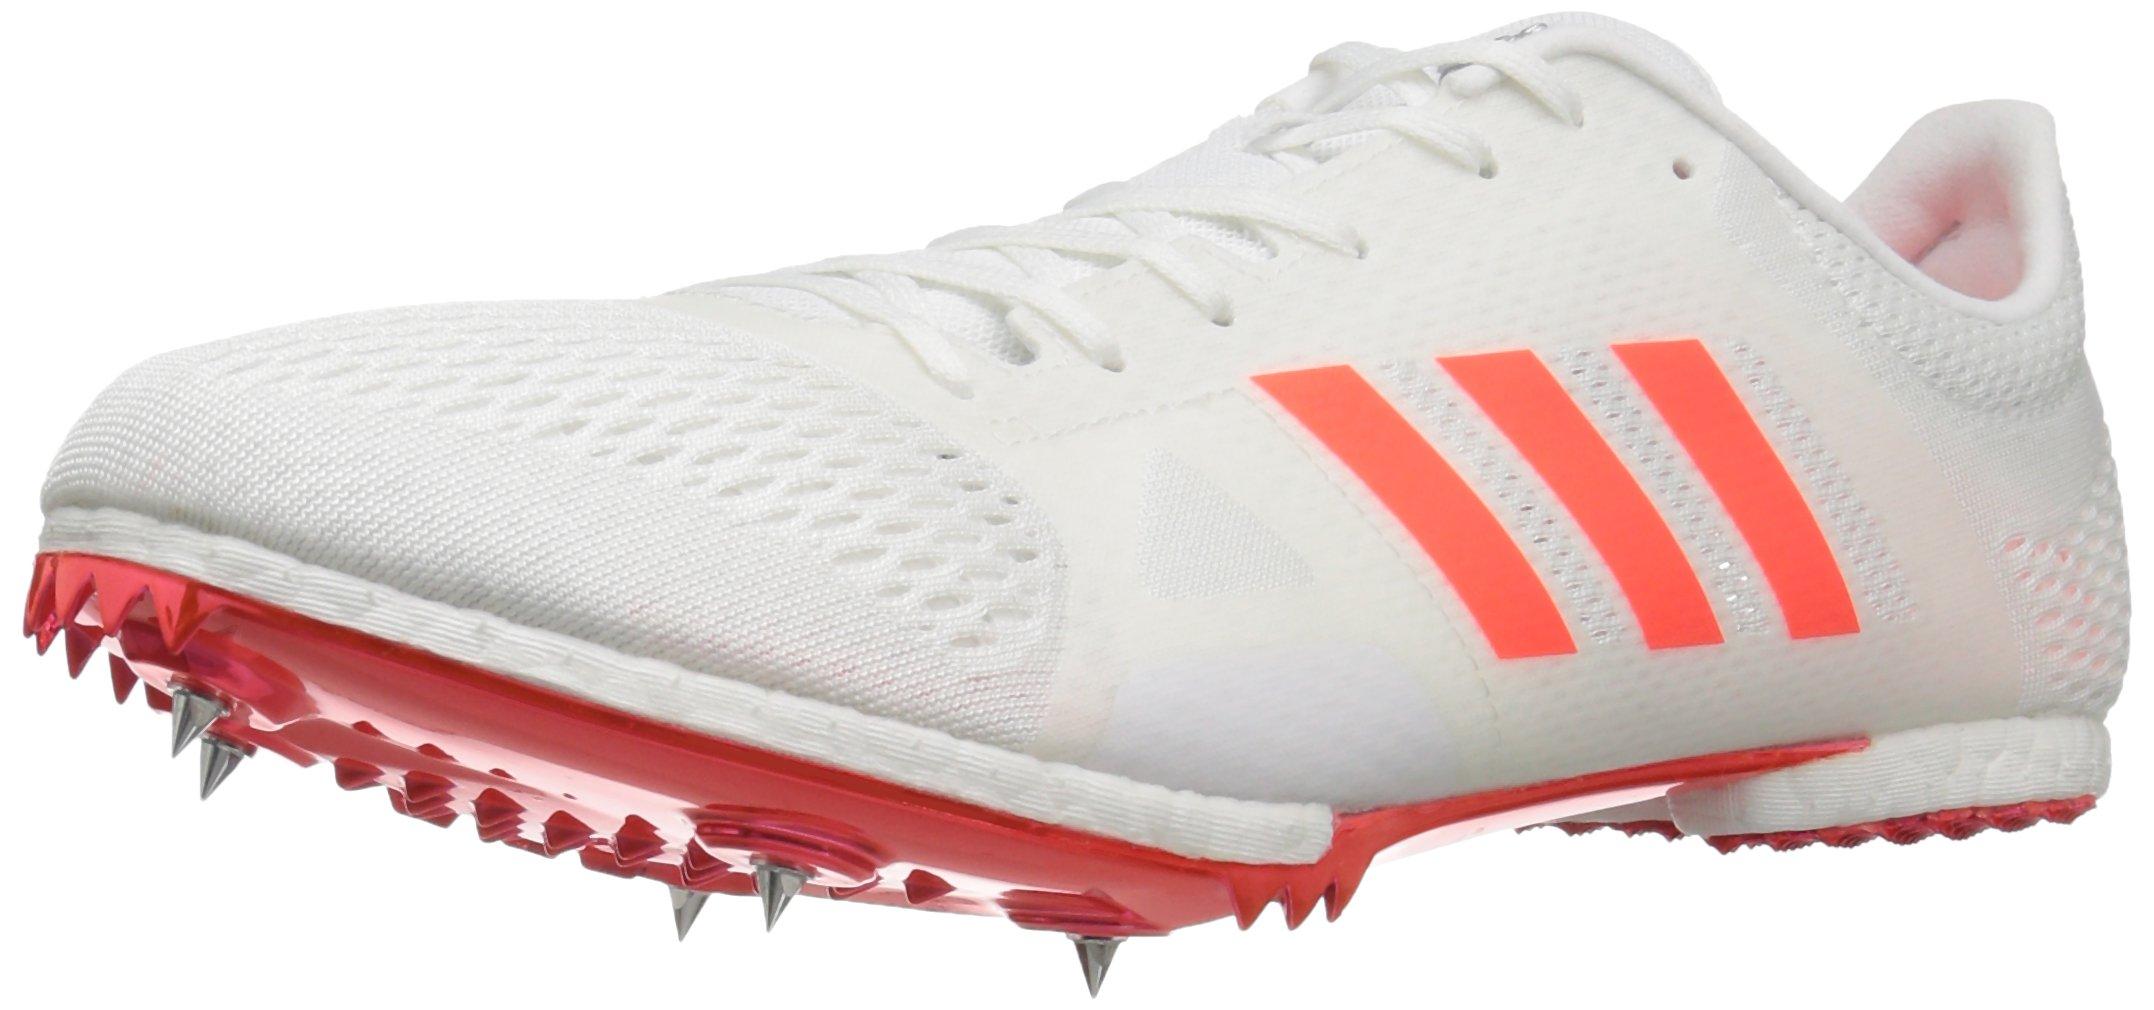 adidas Adizero MD Track Shoe, White/Infrared/Metallic/Silver, 5.5 M US by adidas